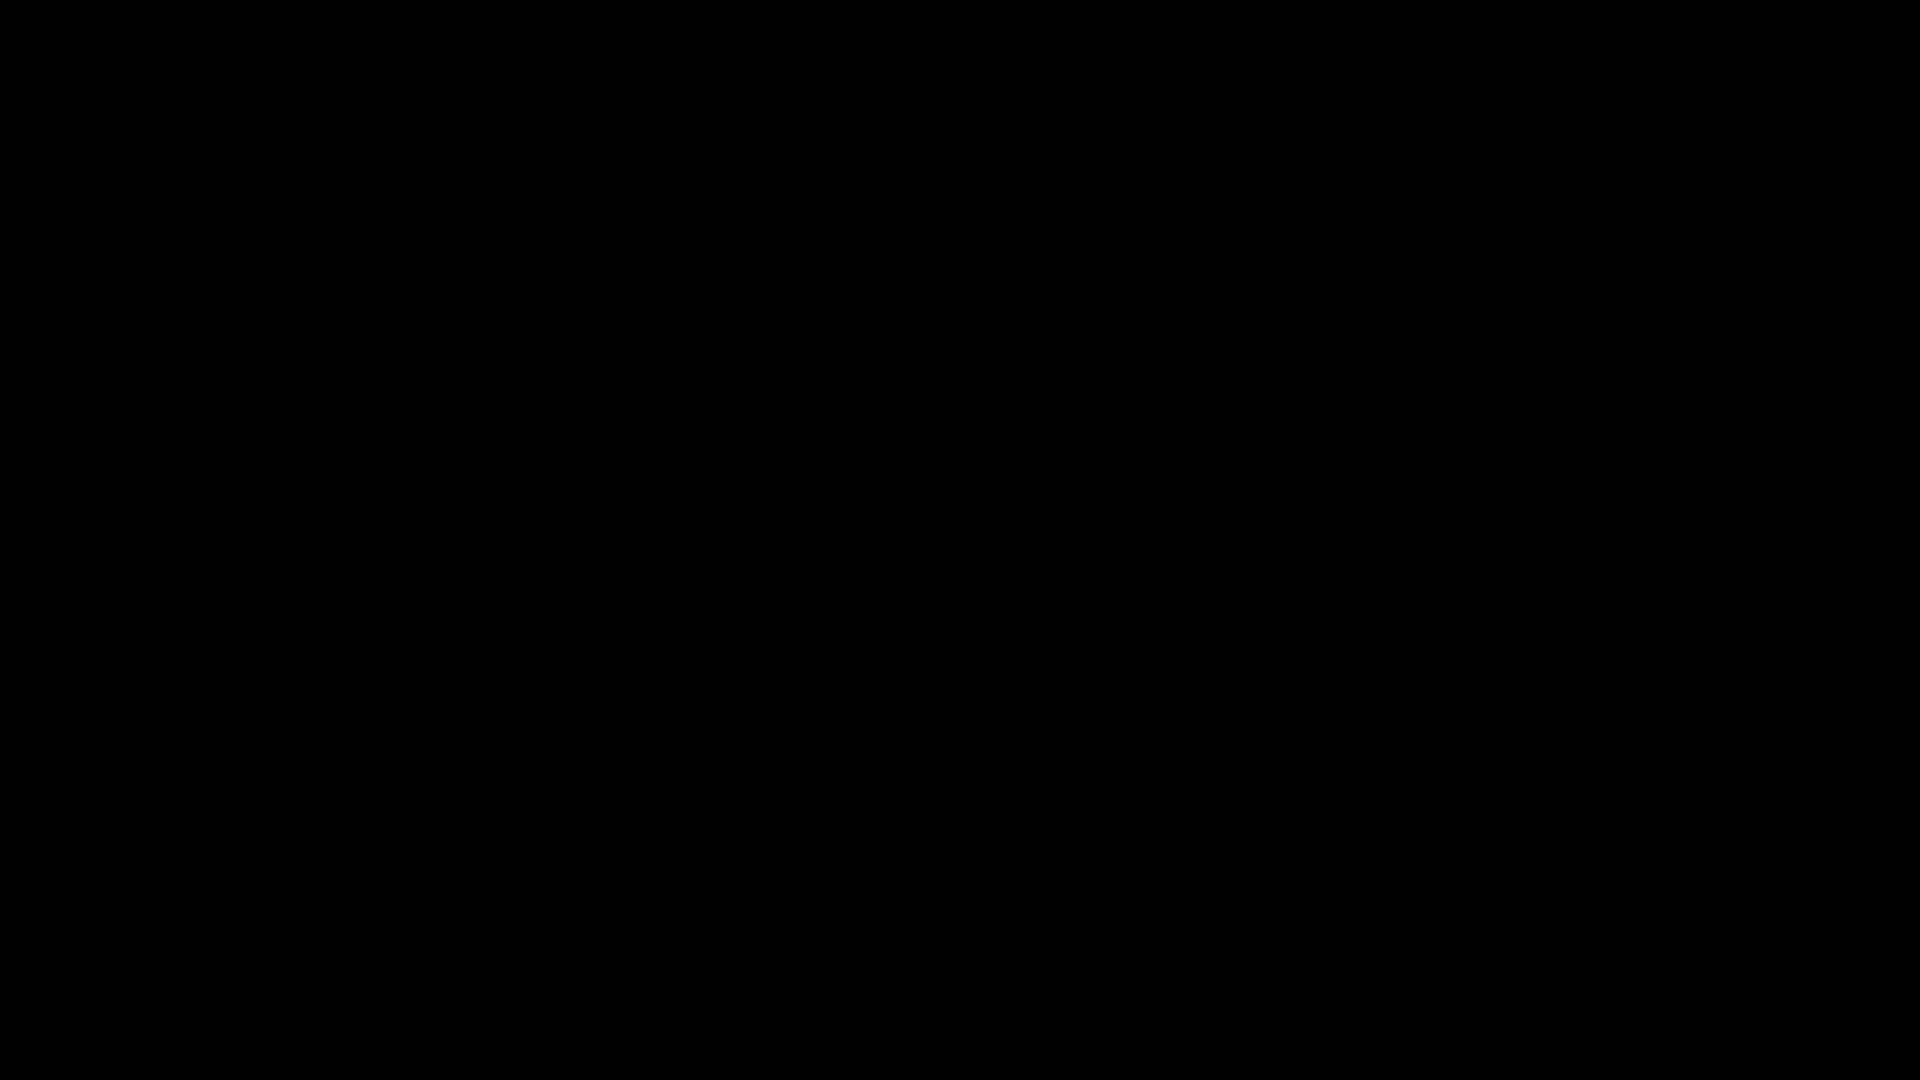 The Finisher Black Background